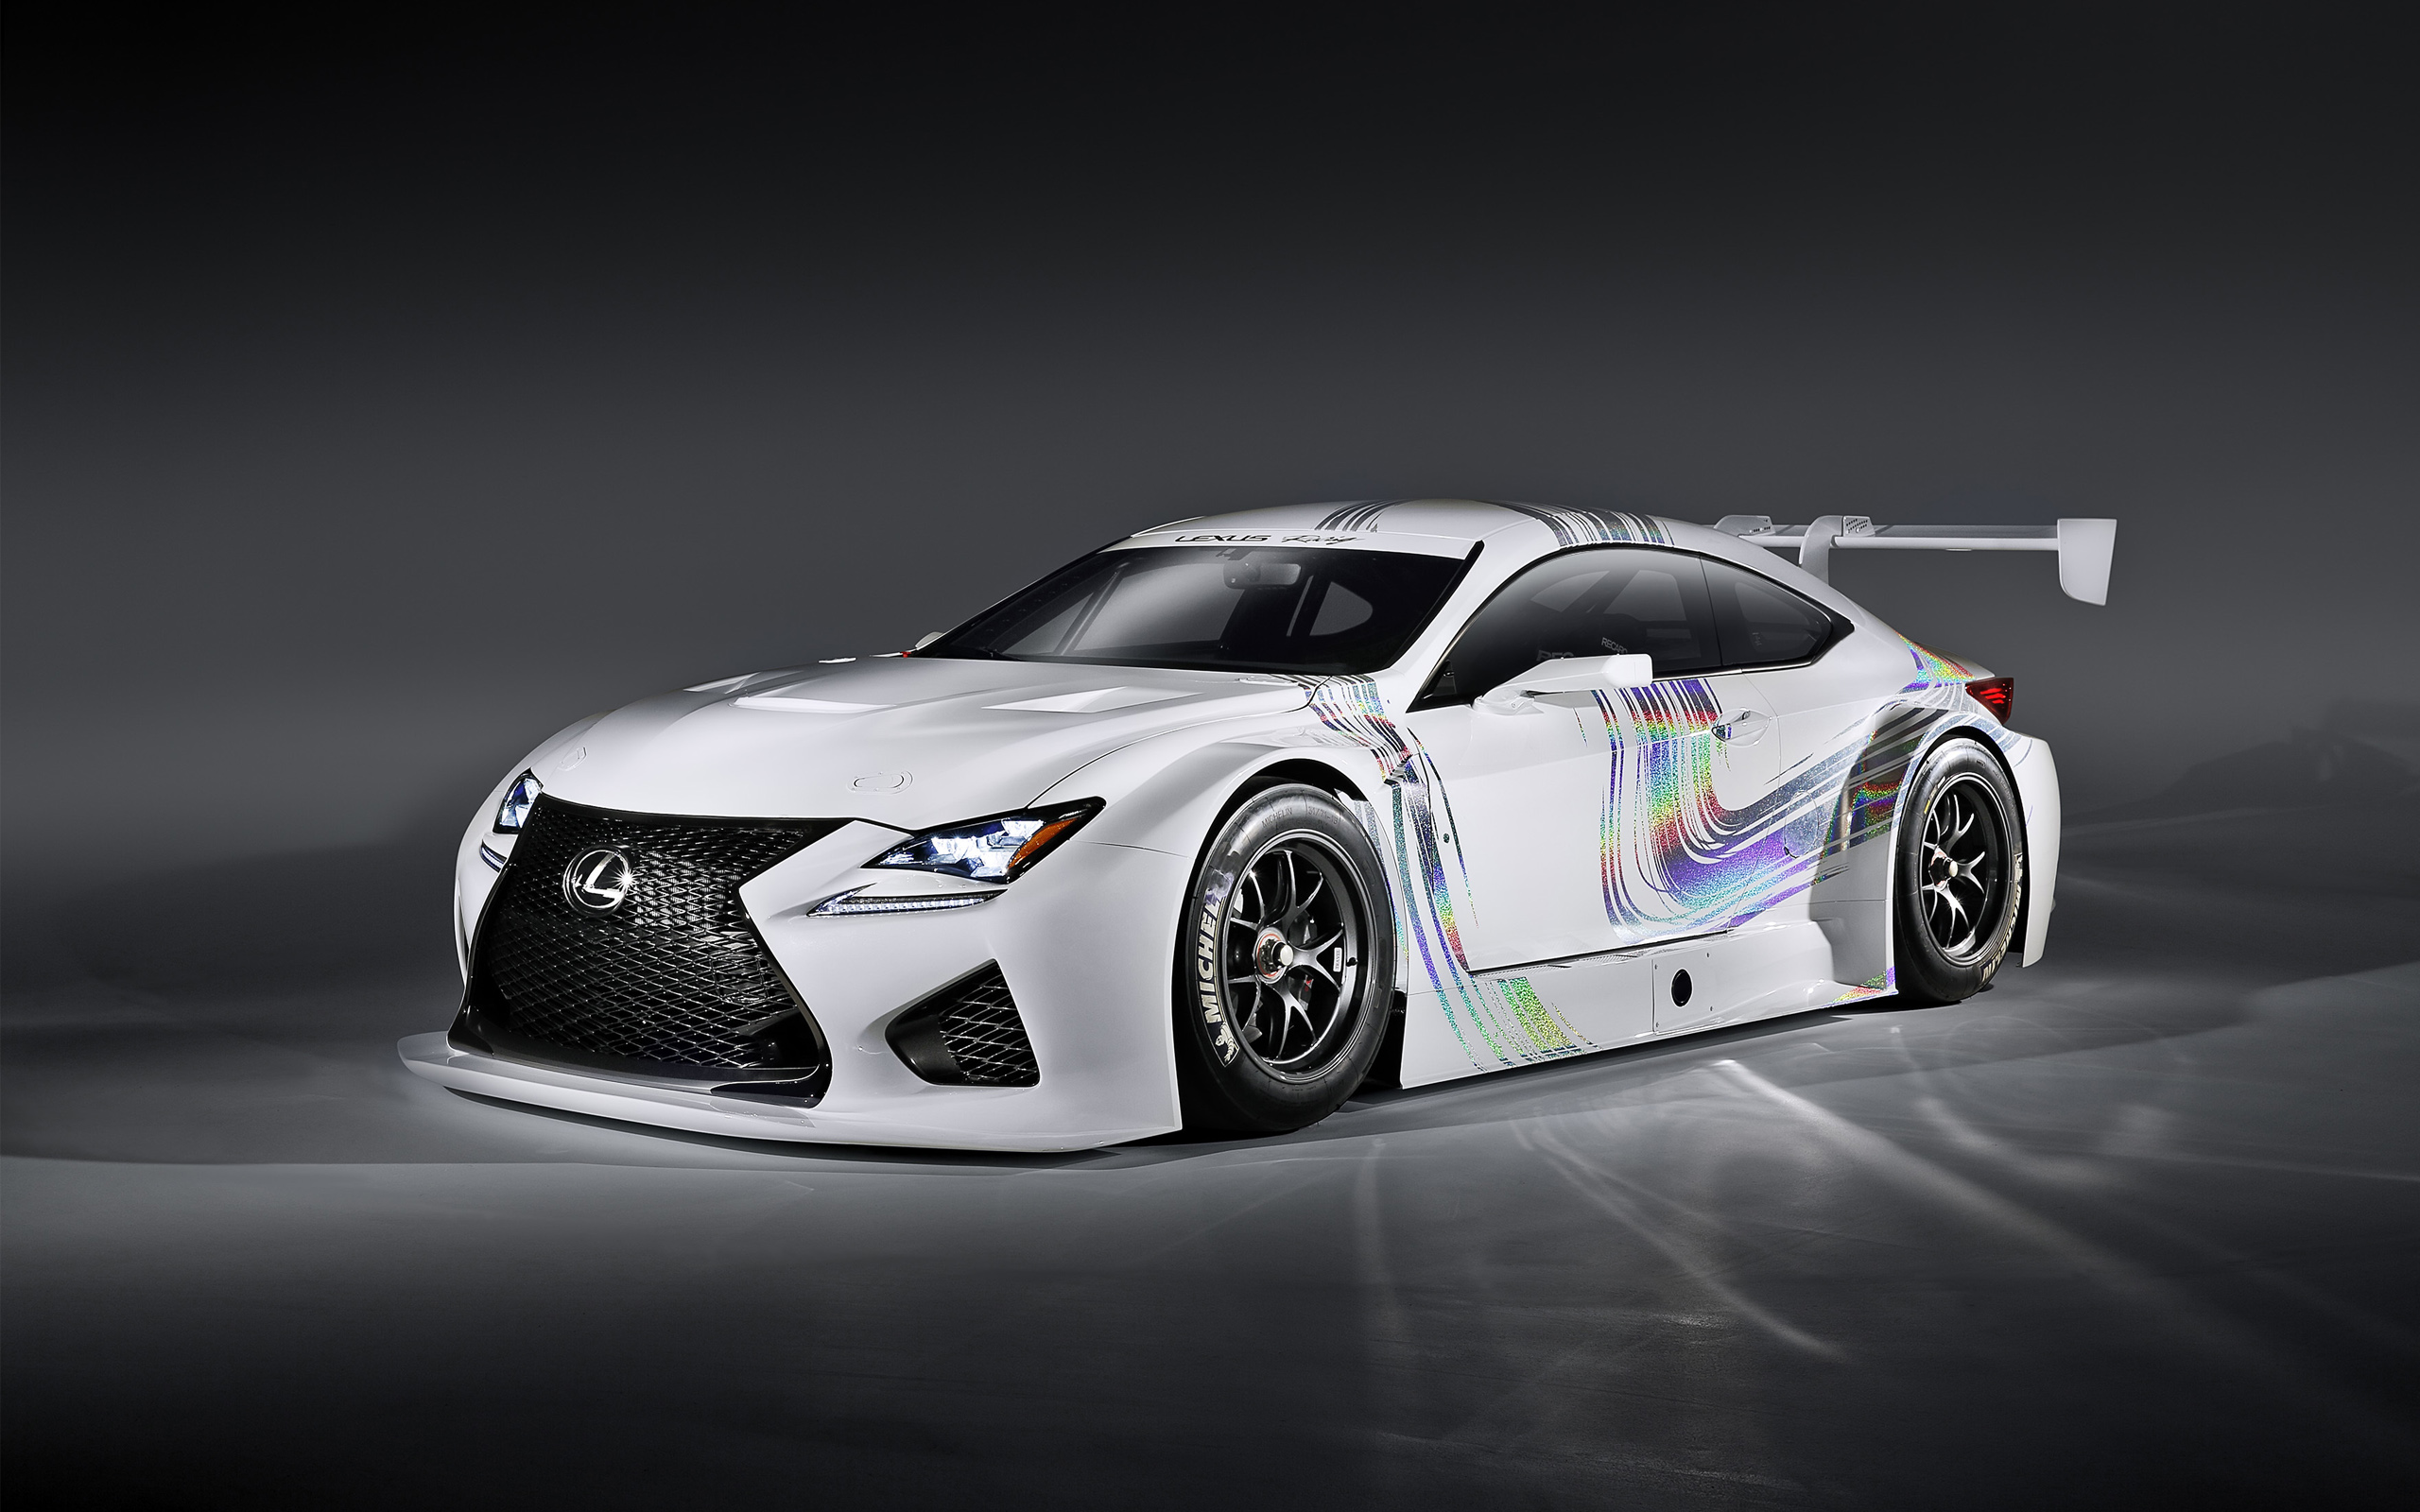 2015 Lexus Isf >> Lexus RC F GT3 Concept Wallpaper | HD Car Wallpapers | ID ...